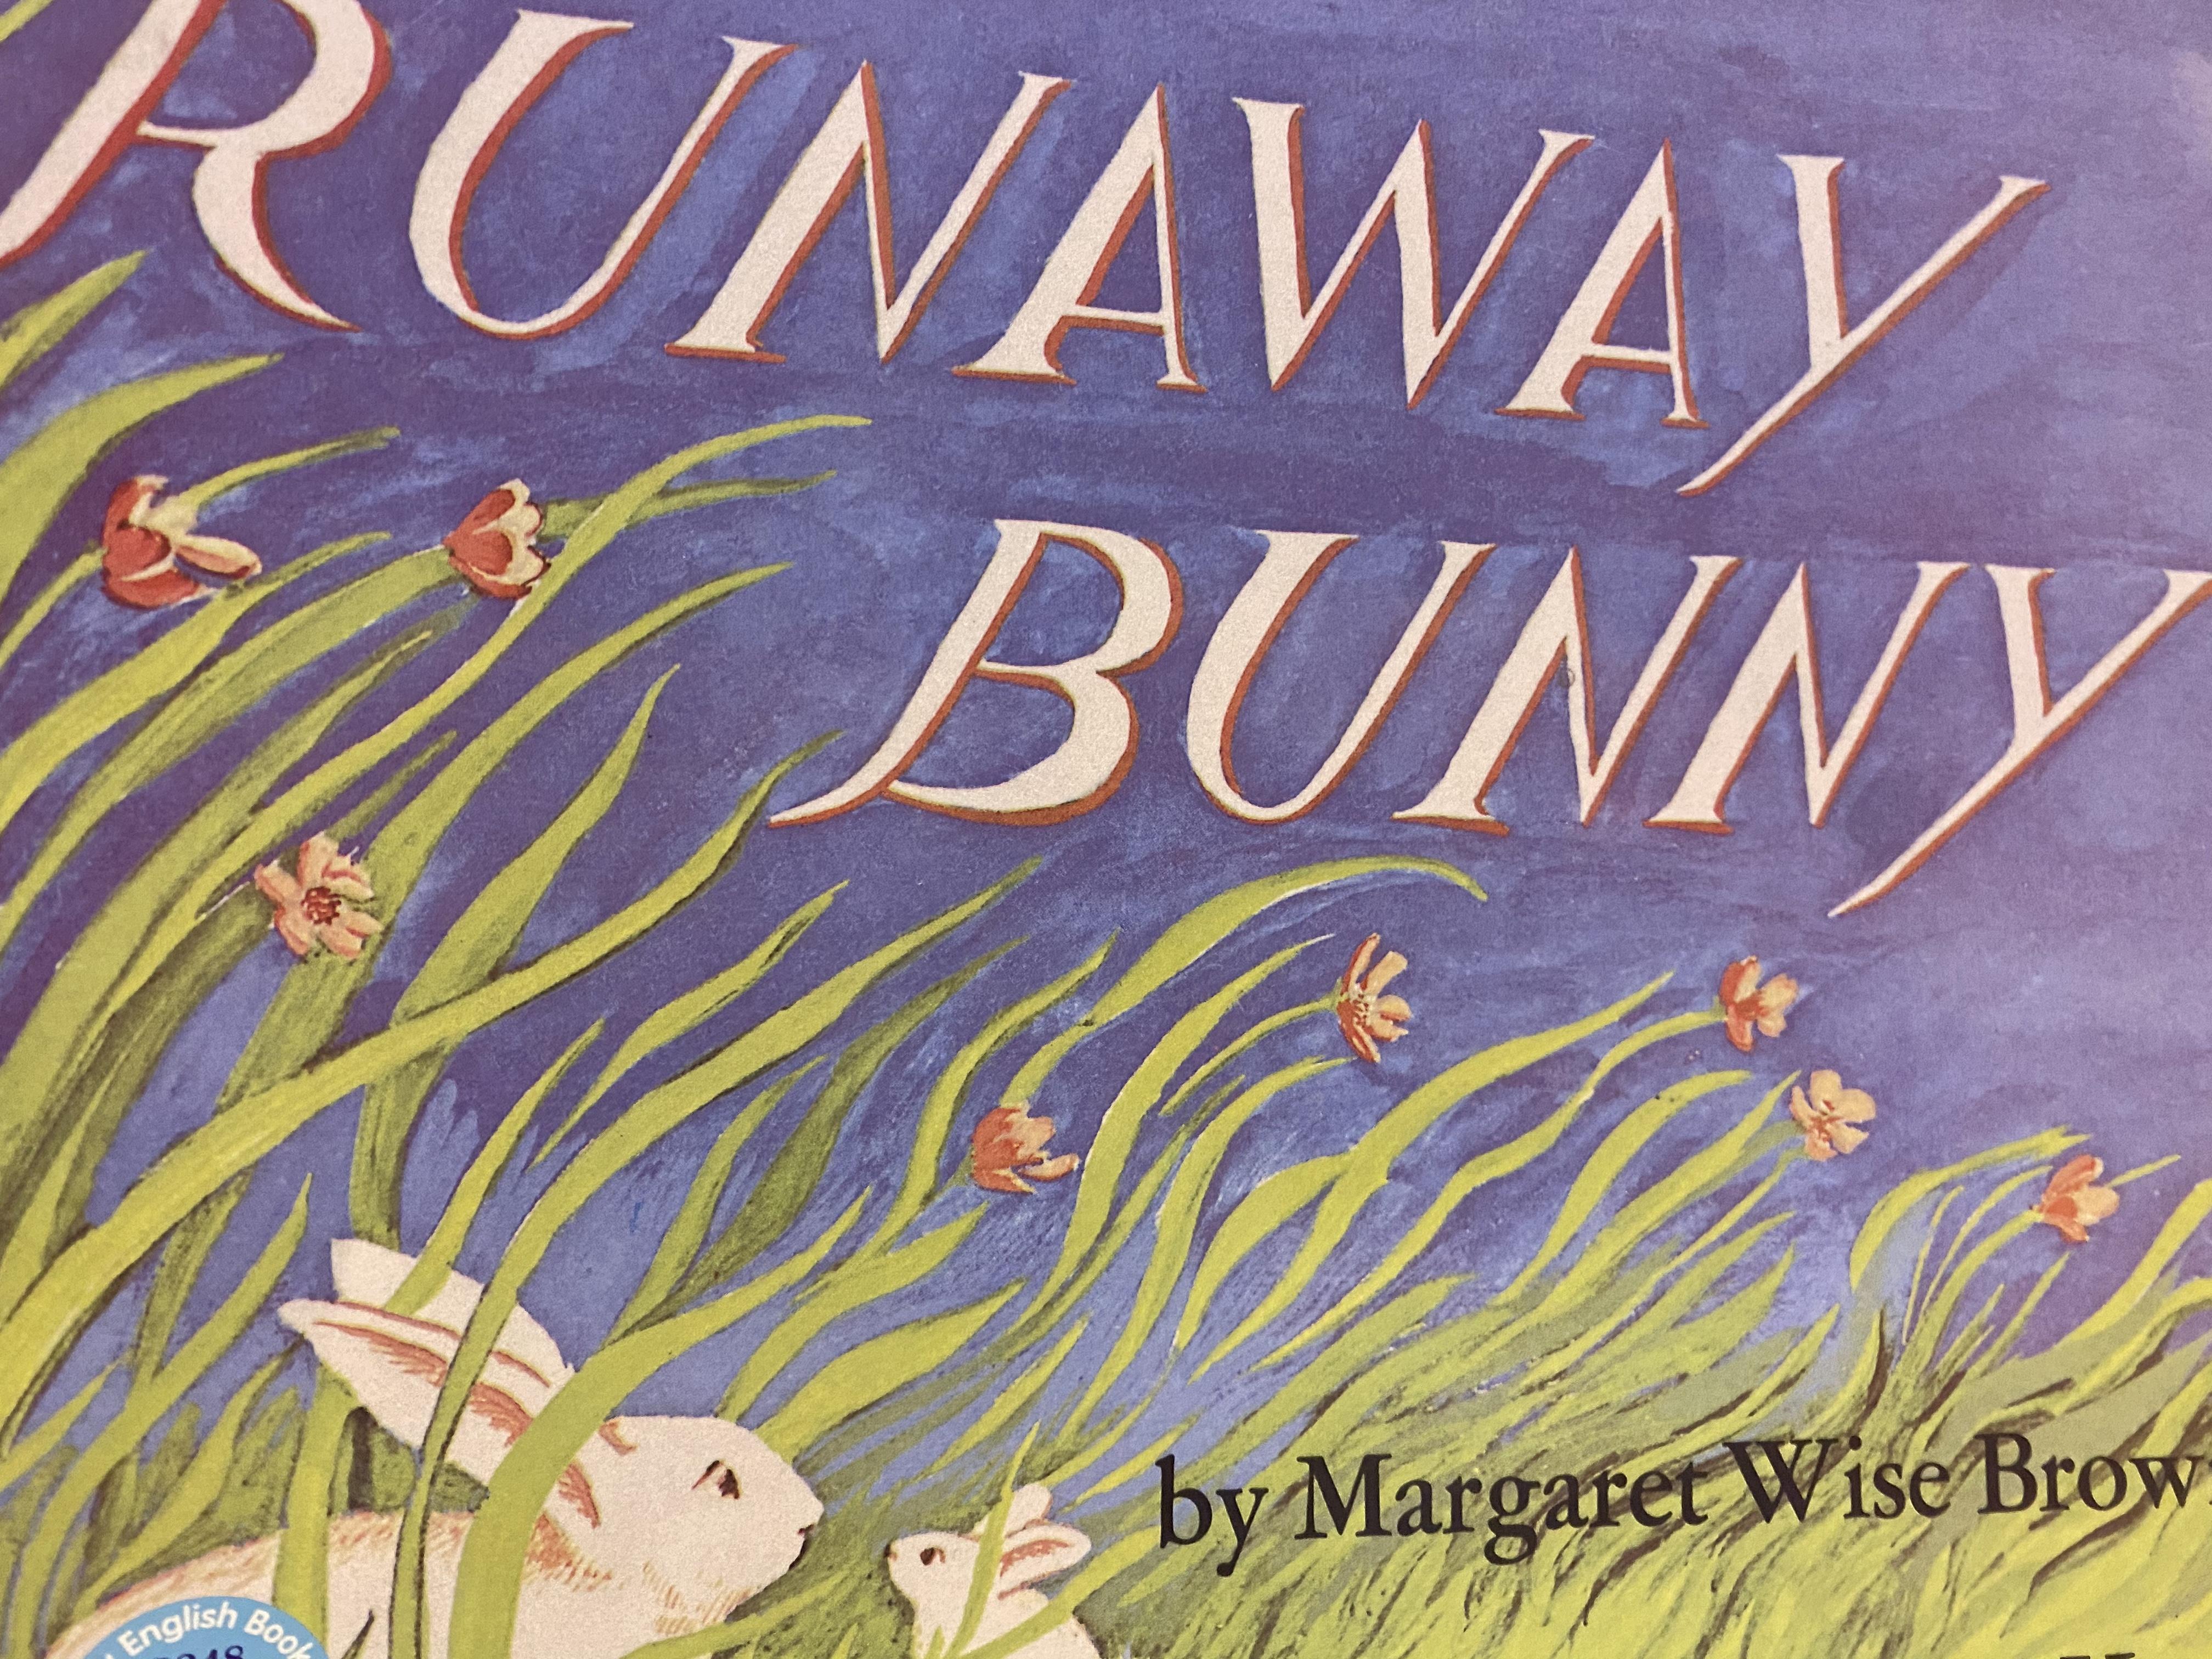 S2-008/ The Runaway Bunny/ Margaret Wise Brown/ 廖采杏老師100本